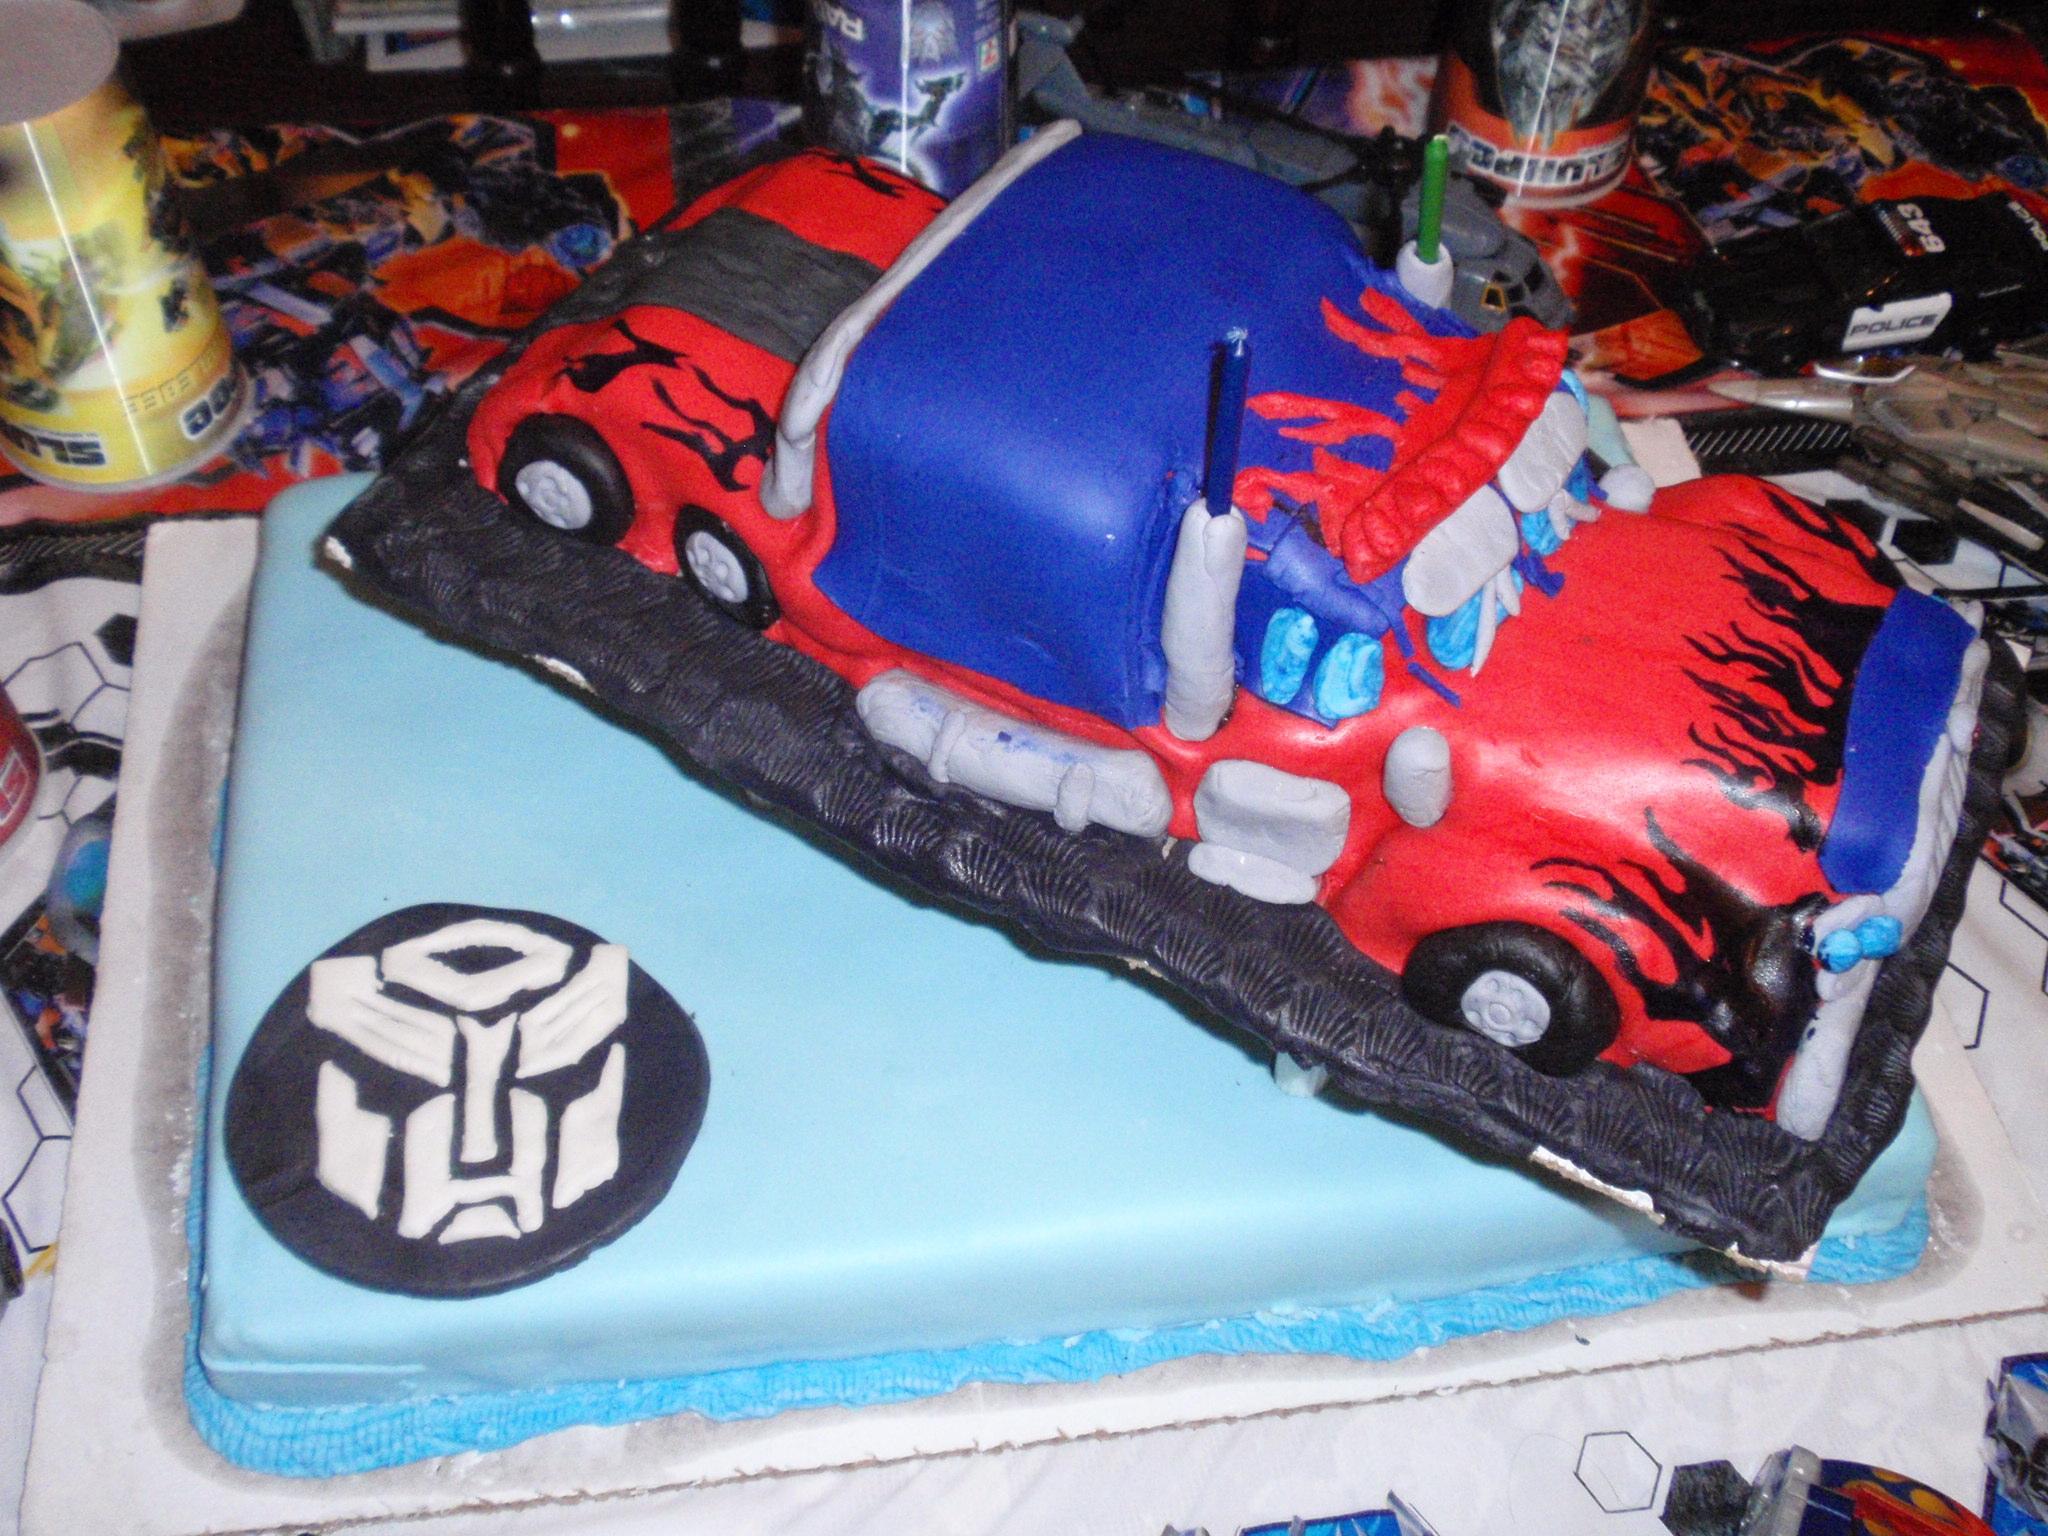 Admirable Transformers Birthday Cakes Thetransformers Net Funny Birthday Cards Online Inifofree Goldxyz